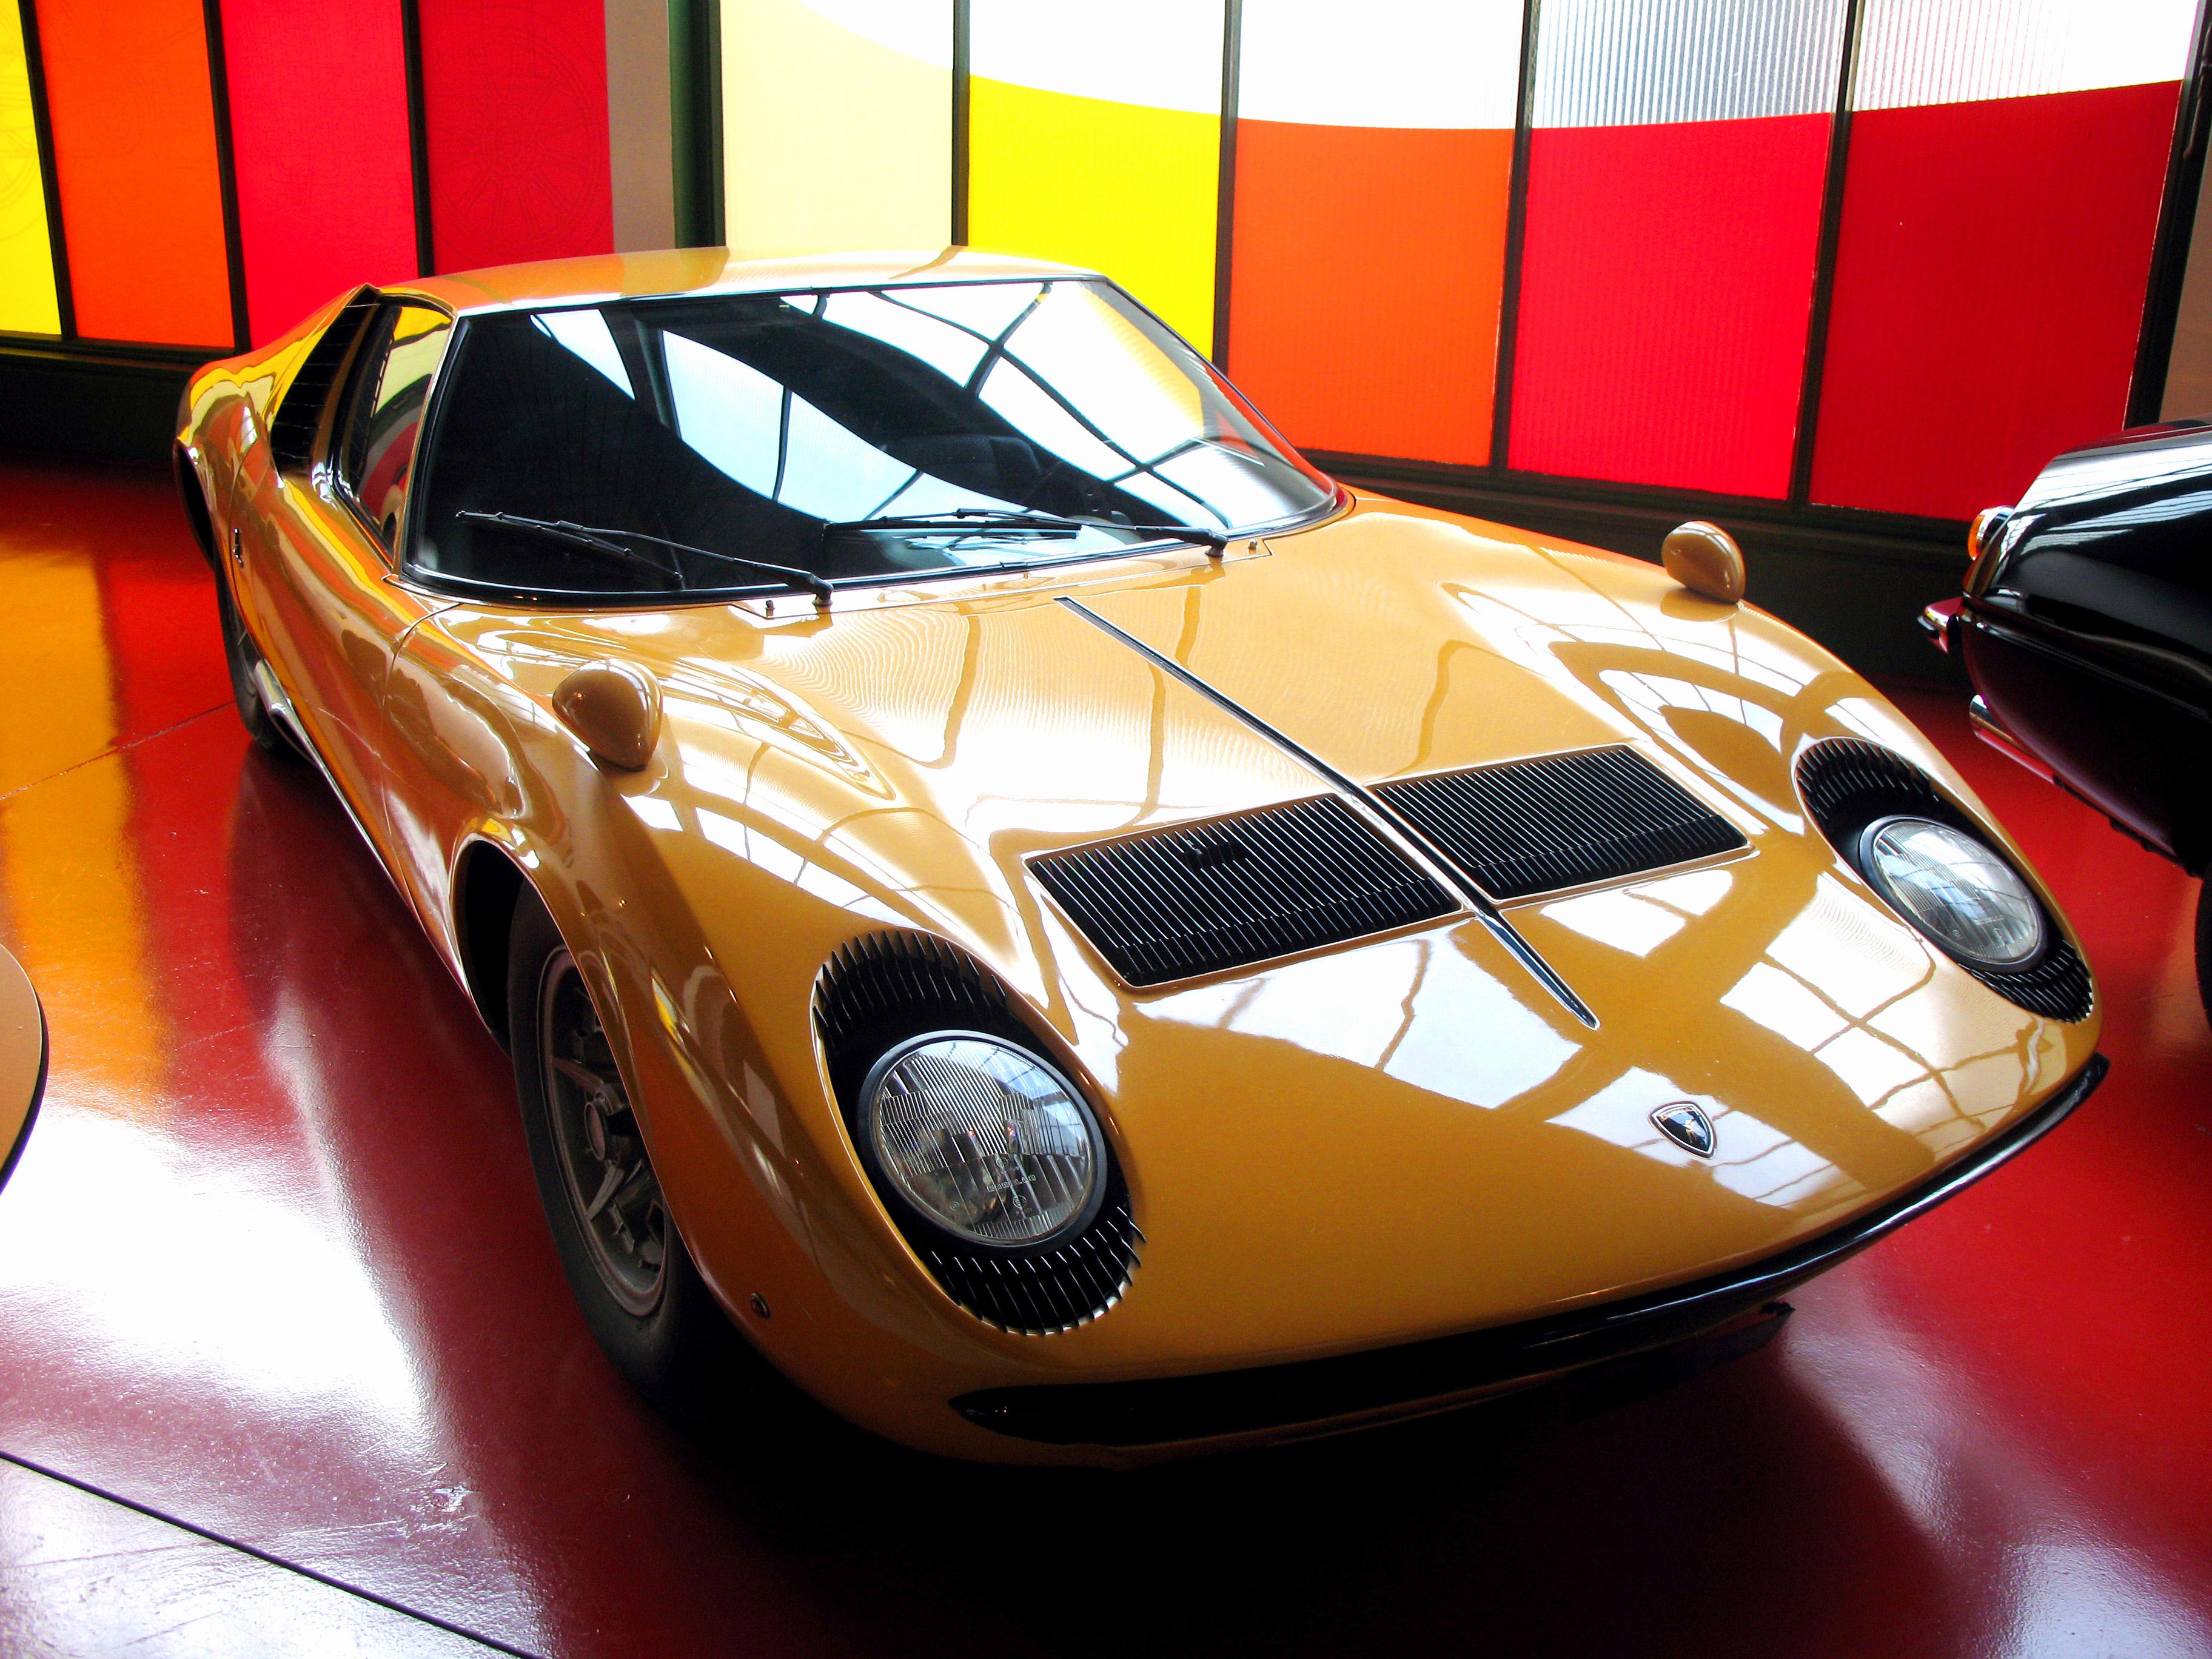 6274_-_Luzern_-_Verkehrshaus_-_Lamborghini_Miura Breathtaking Lamborghini Countach Owners Manual Pdf Cars Trend